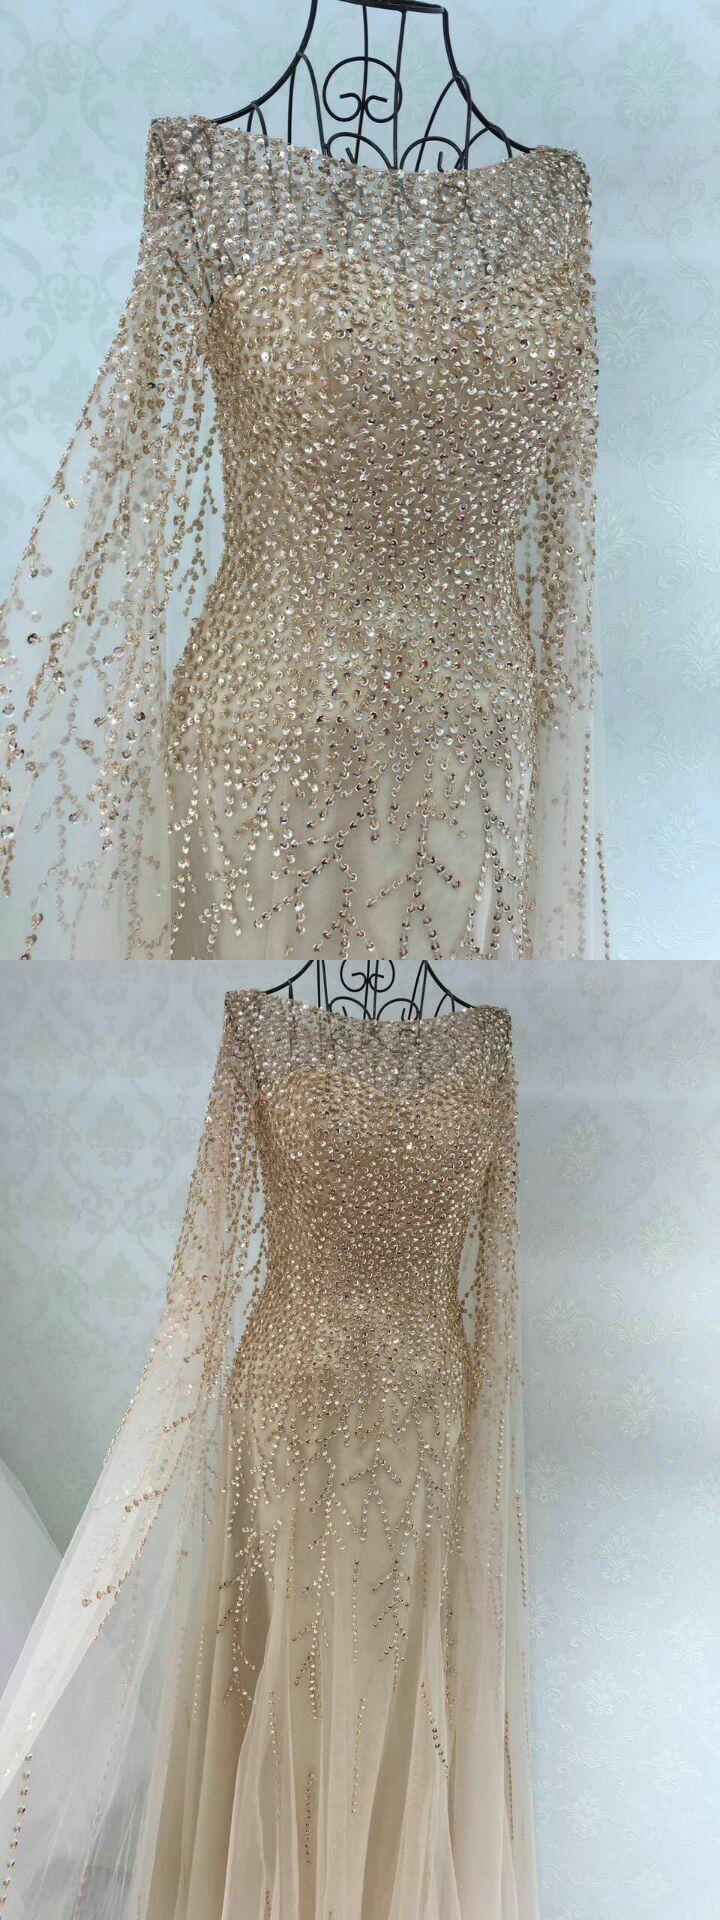 fairy dress, champagne long prom dress, long sleeves prom dress, 2017 prom dress, evening dress, party dress